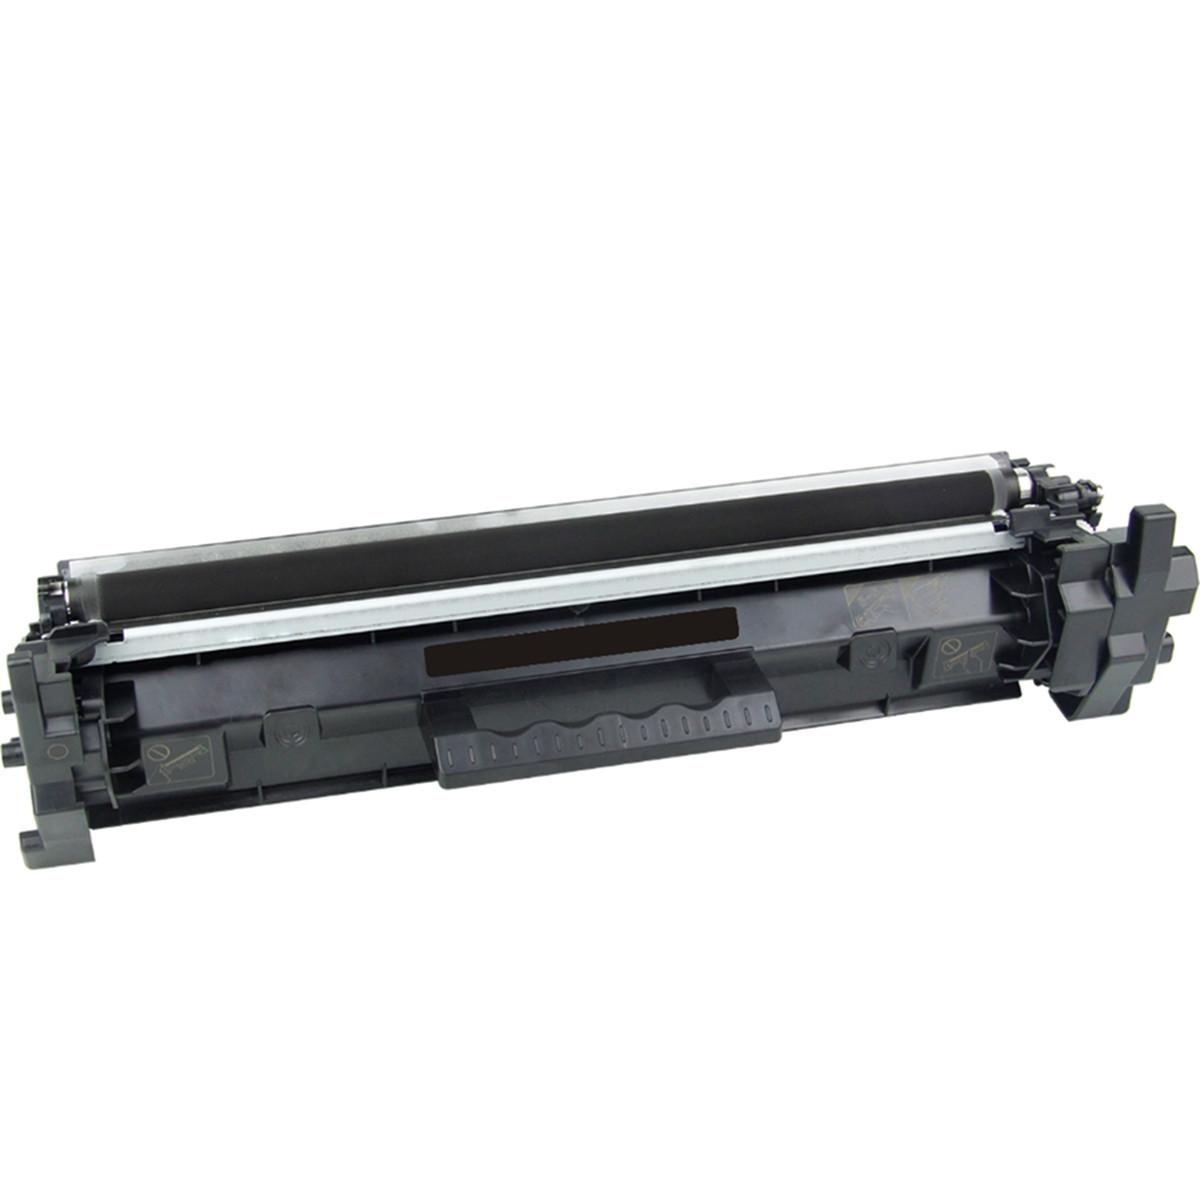 Toner Compatível com HP CF217A 17A | M130 M102 130A 102A 102W 130FN 130FW 130NW | Premium 1.6k